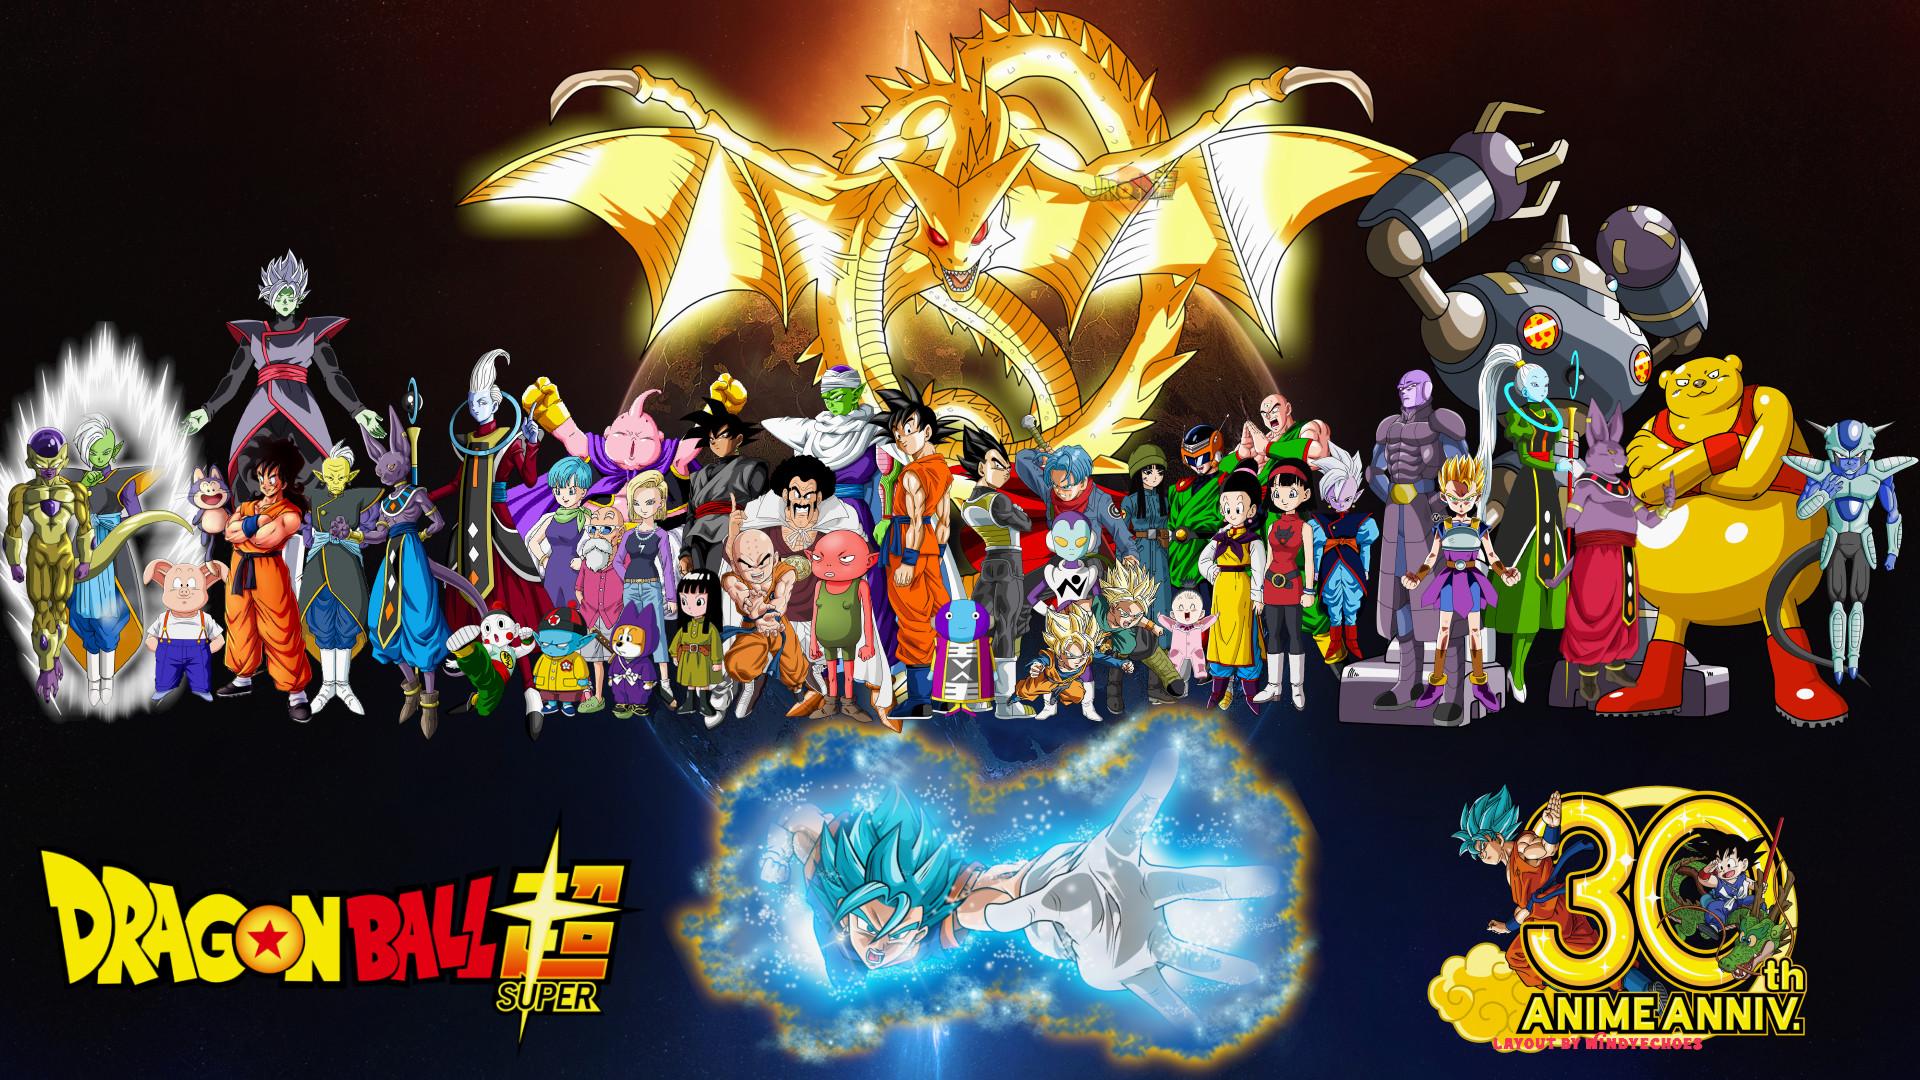 1920x1080 Dragon Ball Xenoverse PS4 Goku Piccolo DBZanto Vs Raditz Saiyan Saga Part 5aEUR 60FPS 1080PaEUR